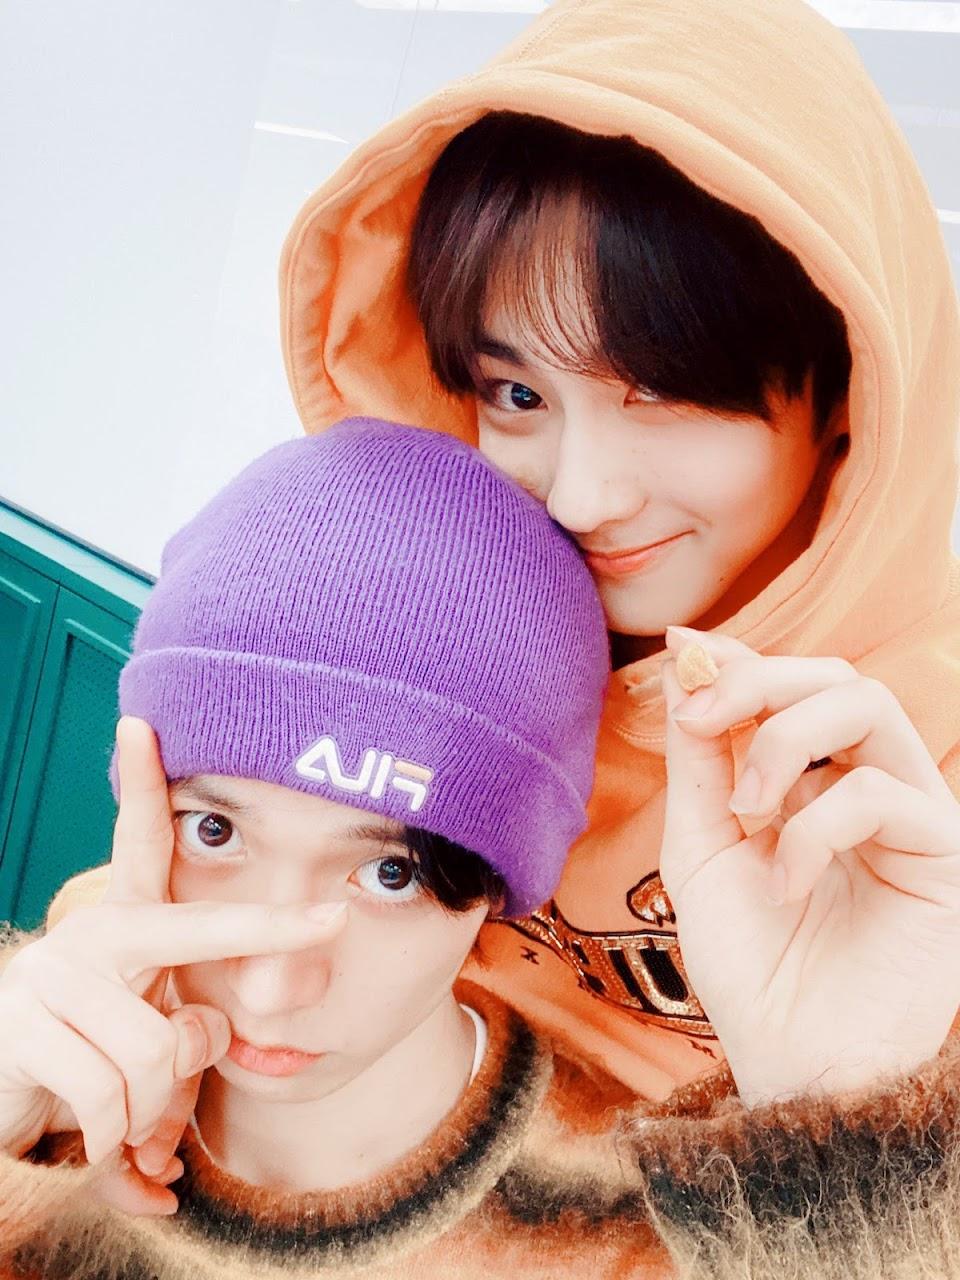 enhypen heeseung jungwon @ENHYPEN_members